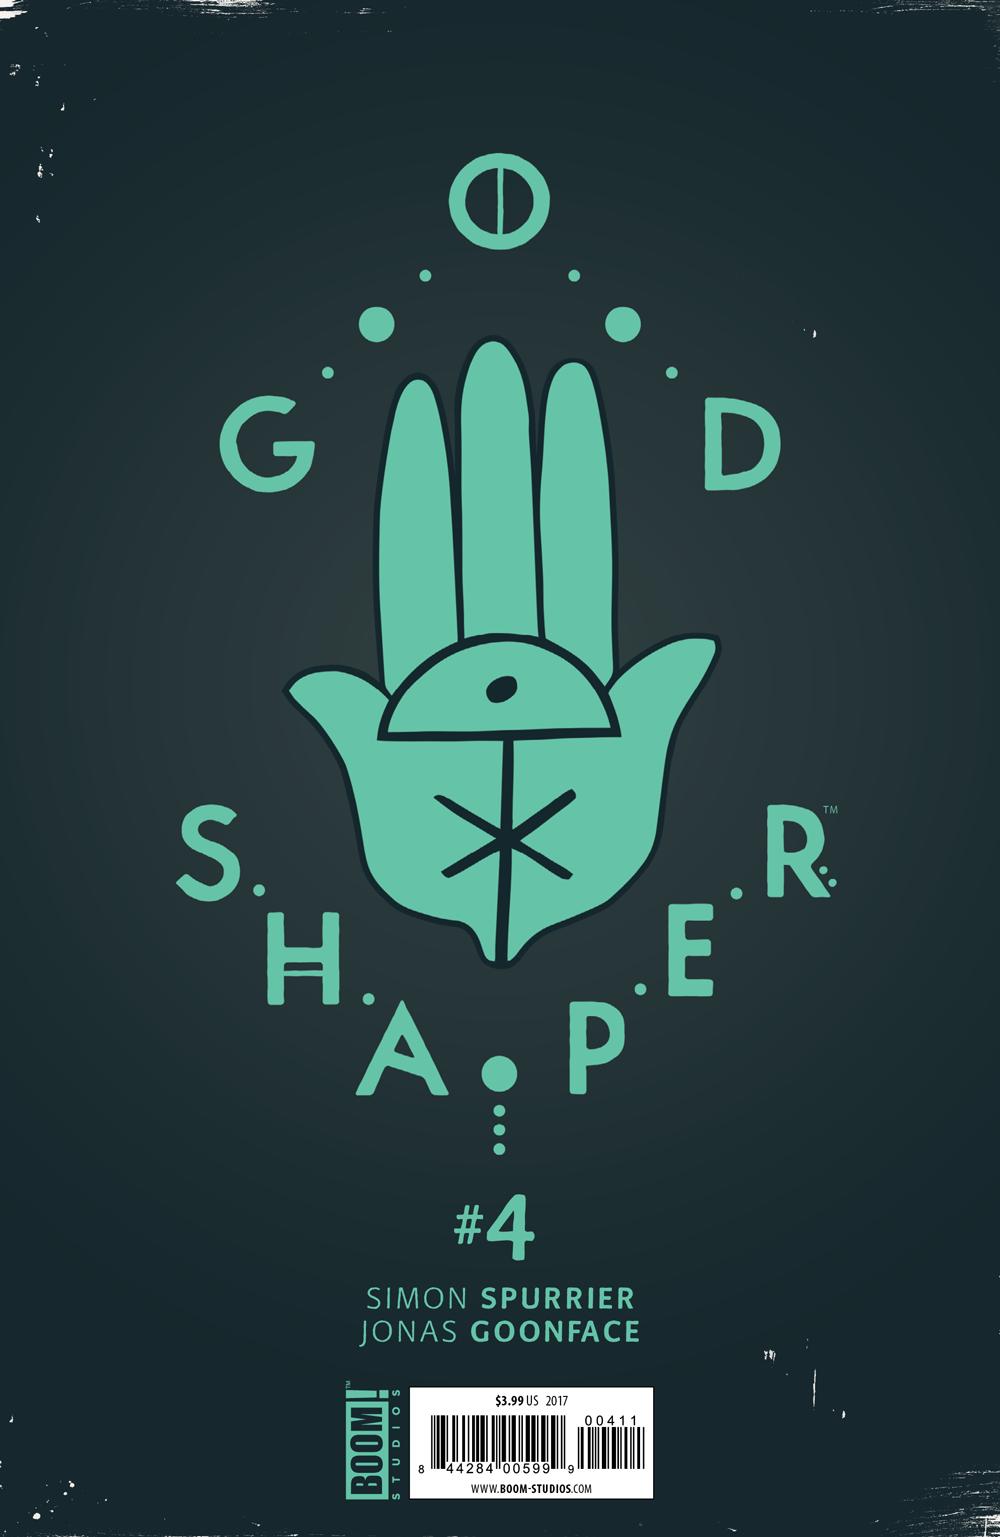 Godshaper_004_2.png